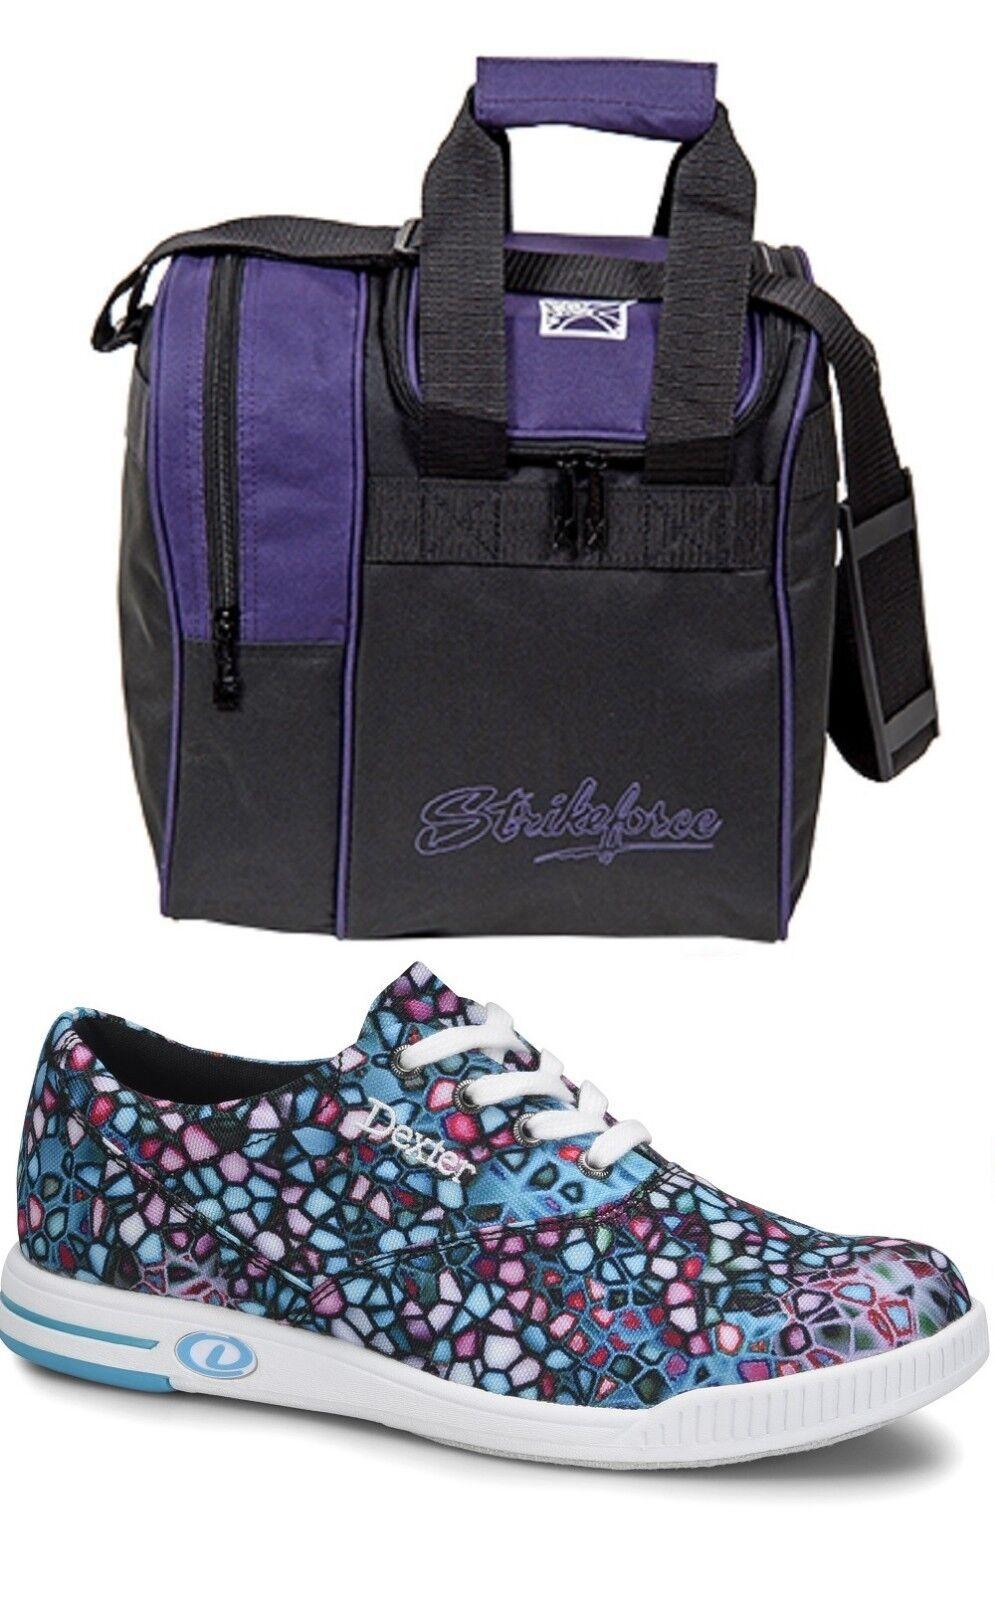 Womens Dexter KERRIE Multi-color Bowling shoes Sizes 6-11 & Purple 1 Ball Bag